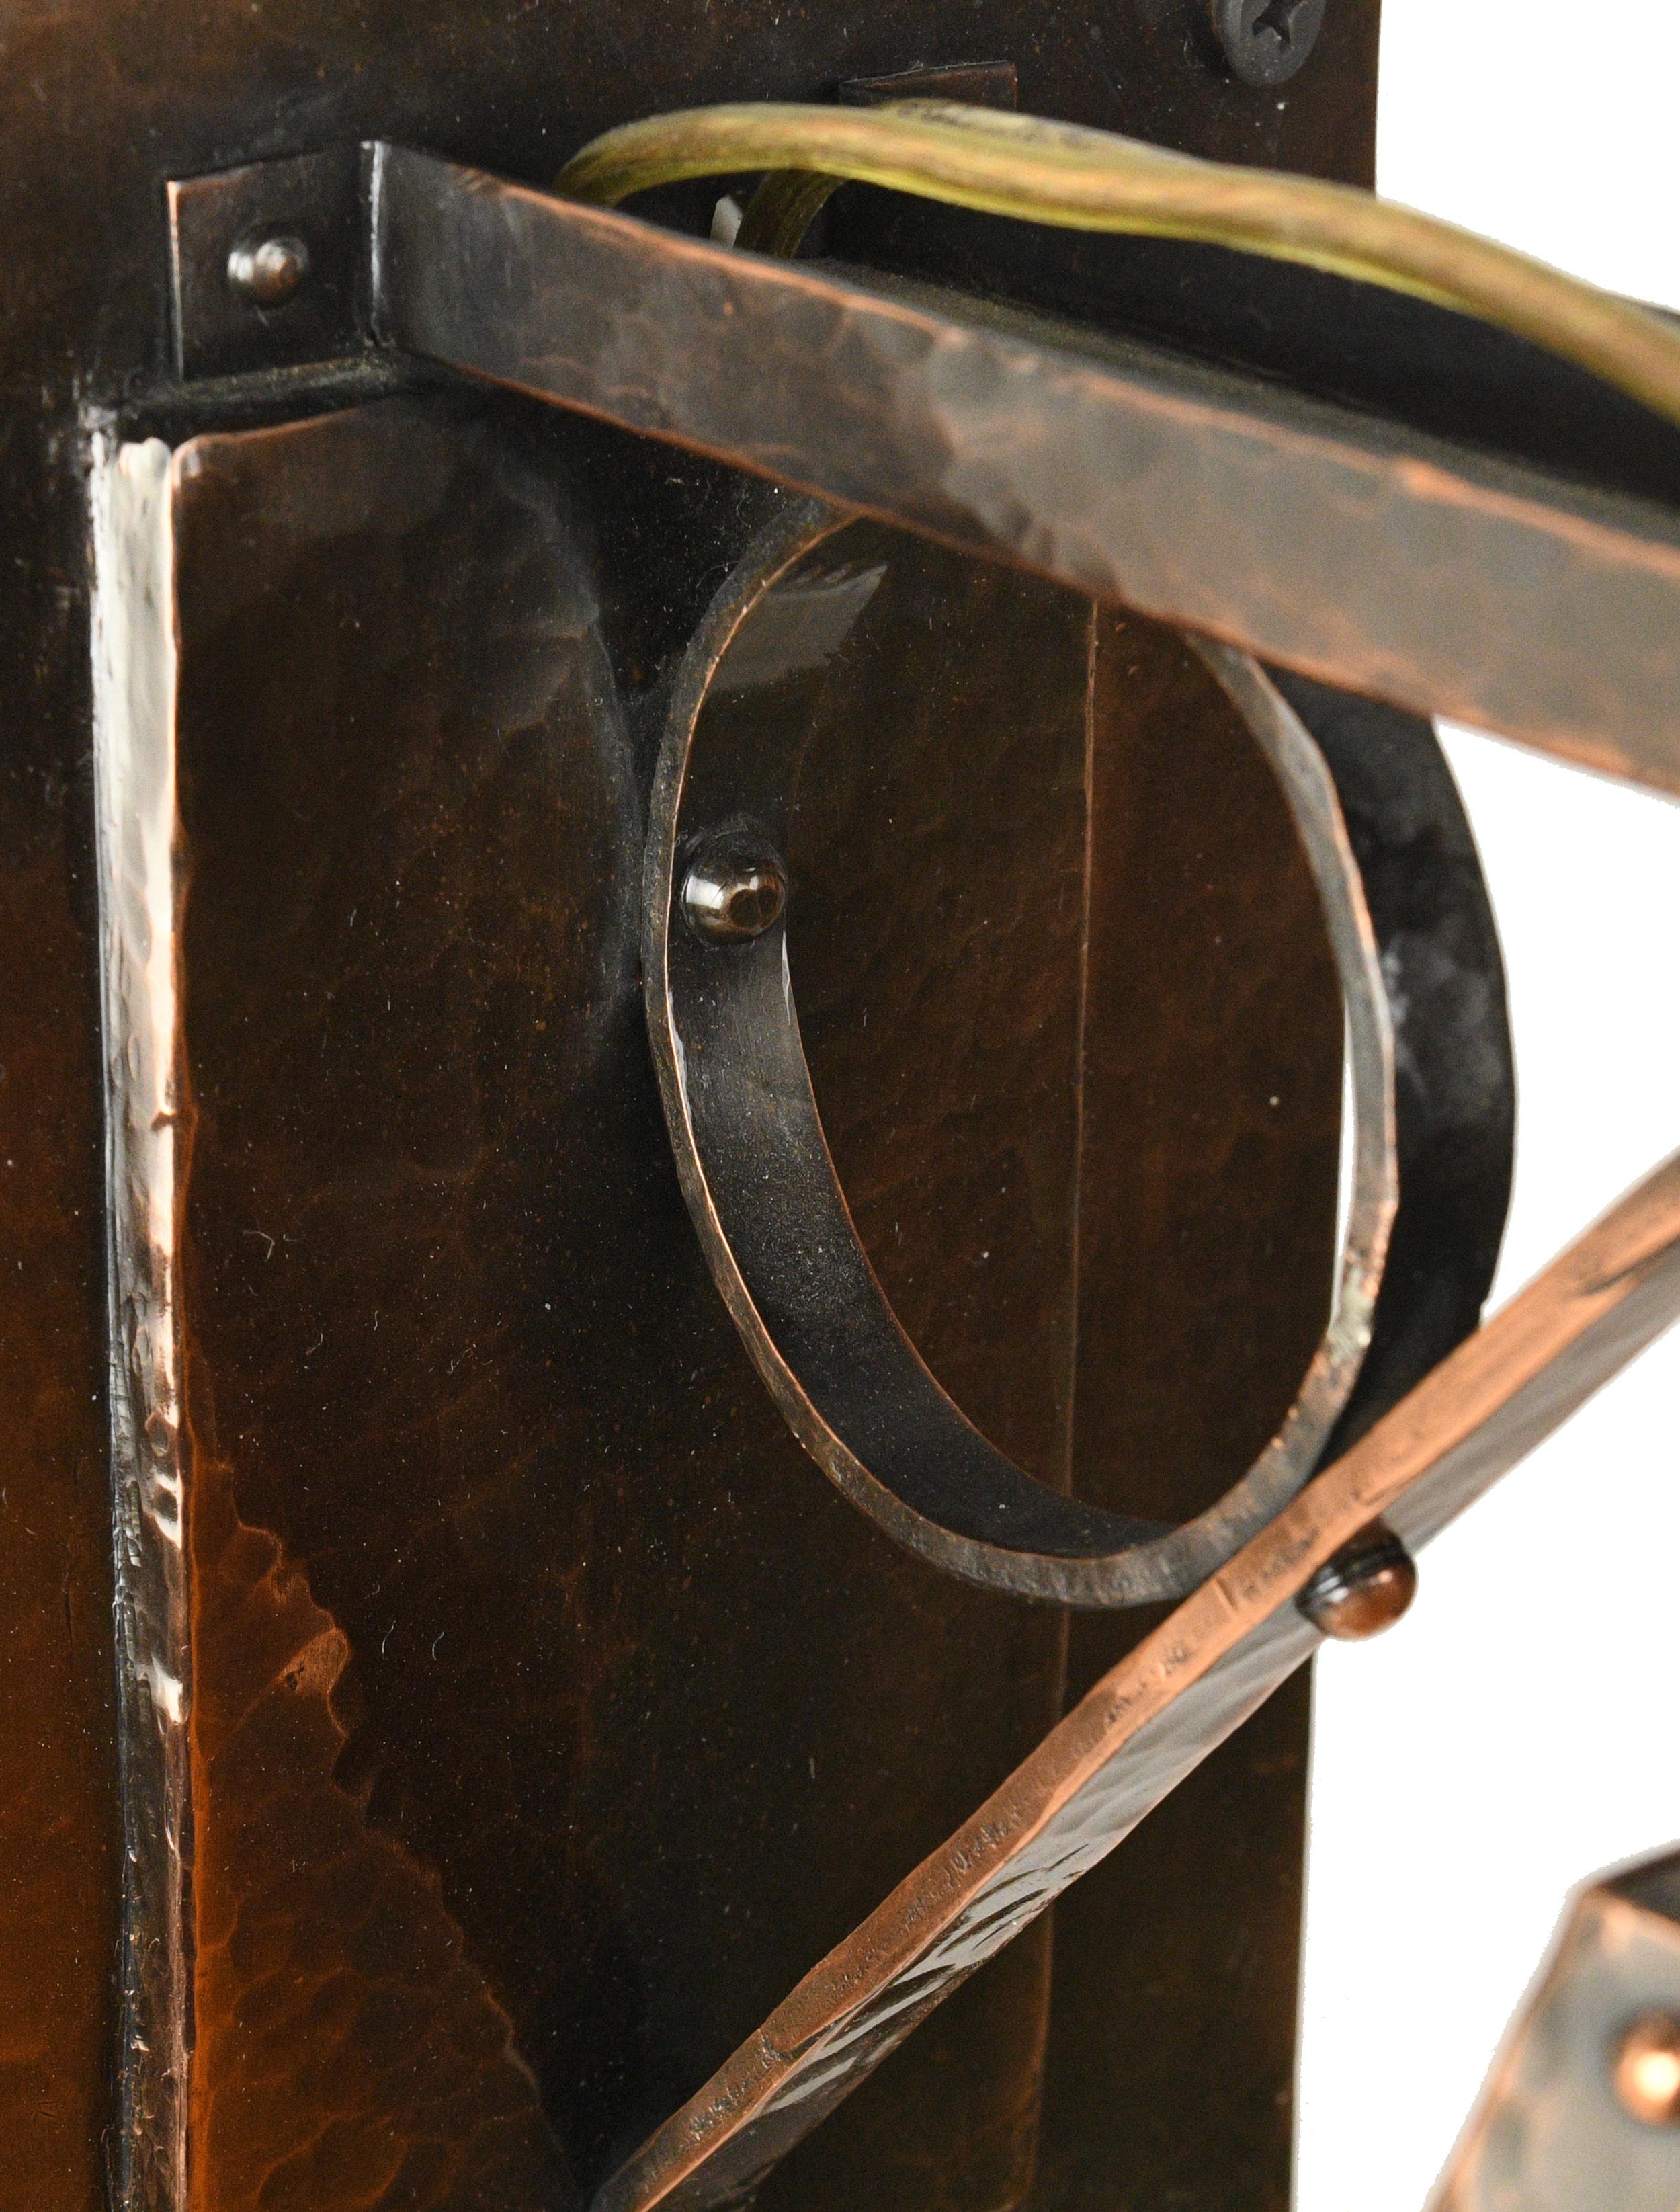 47771-slag-glass-bracket-sconce-close-2.jpg